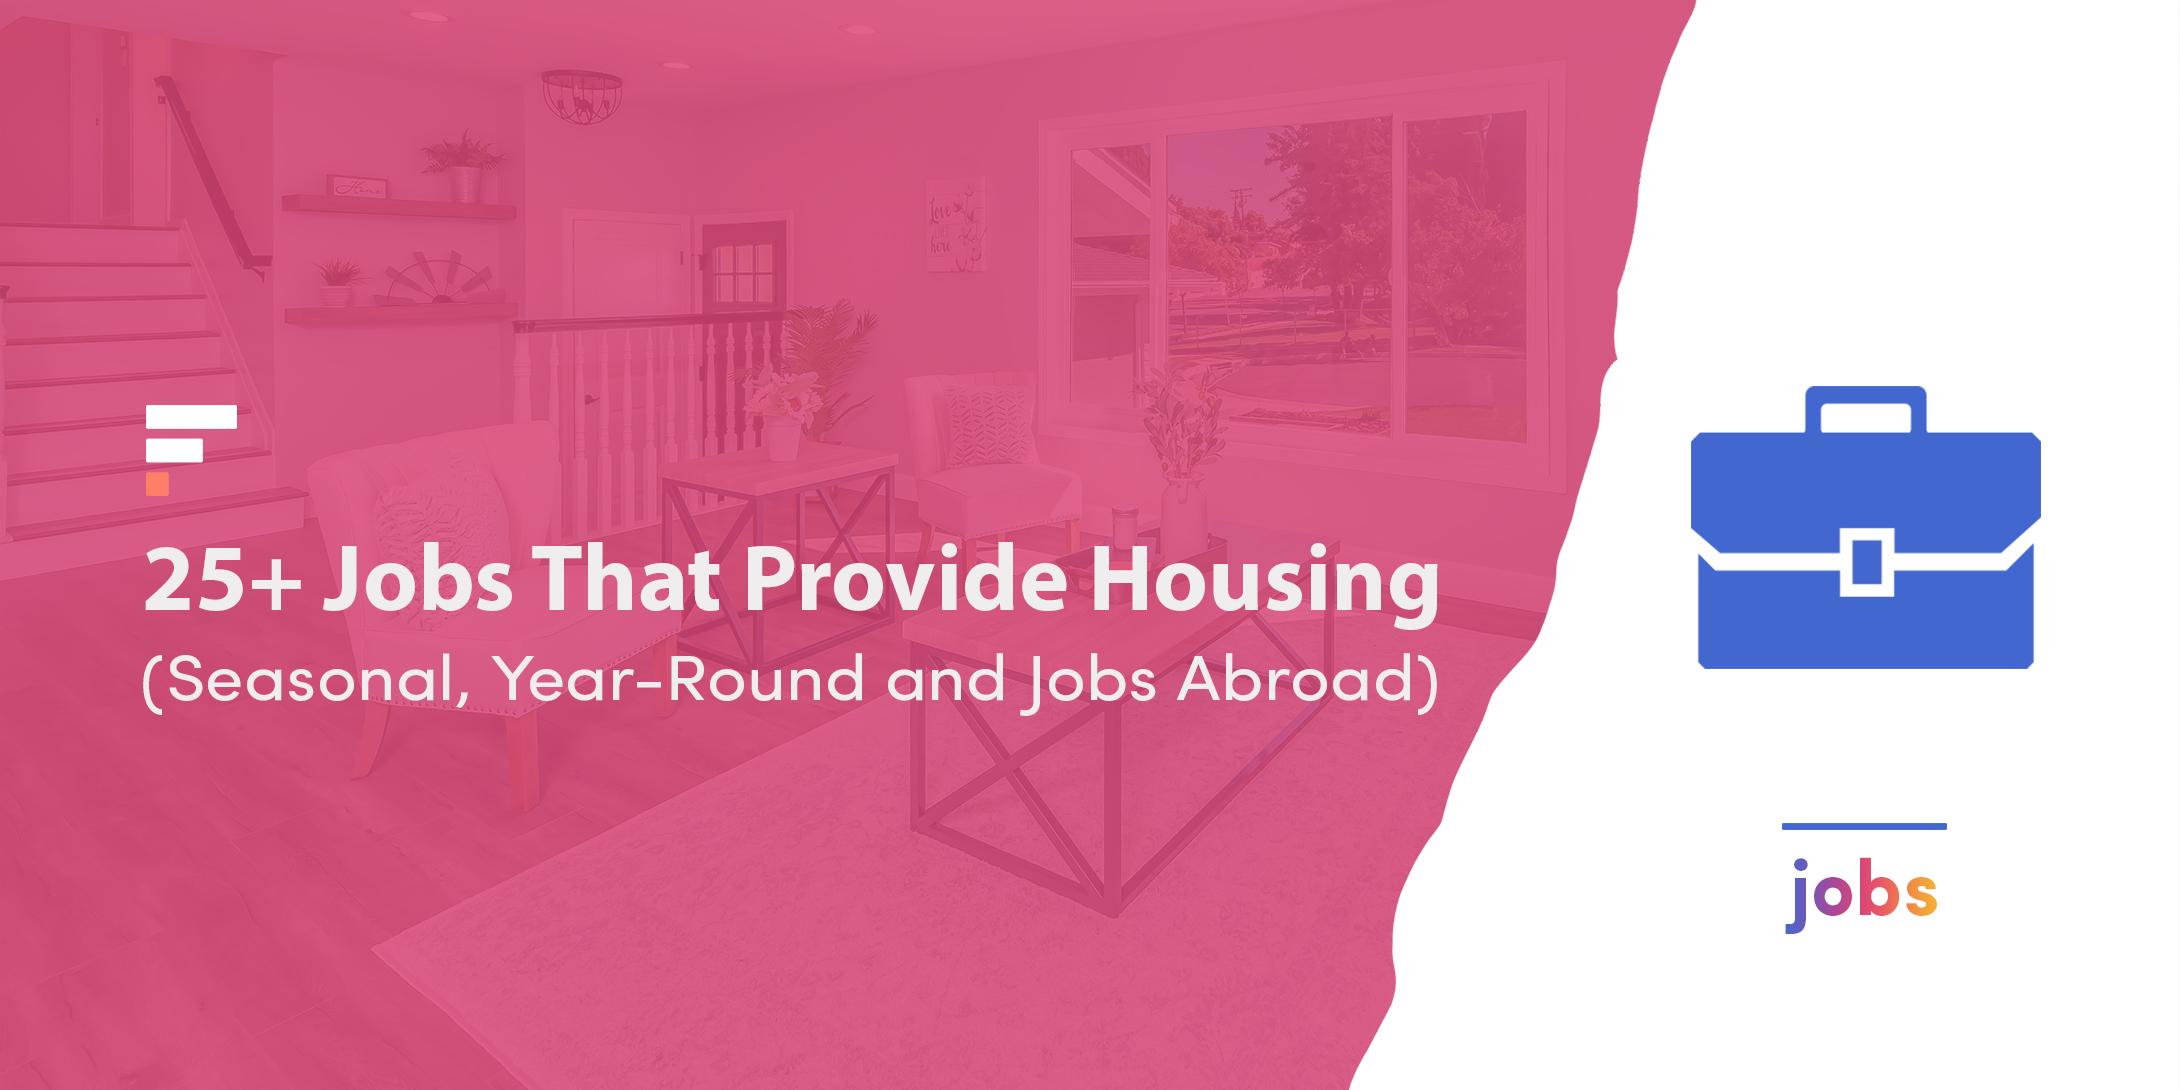 Jobs that provide housing